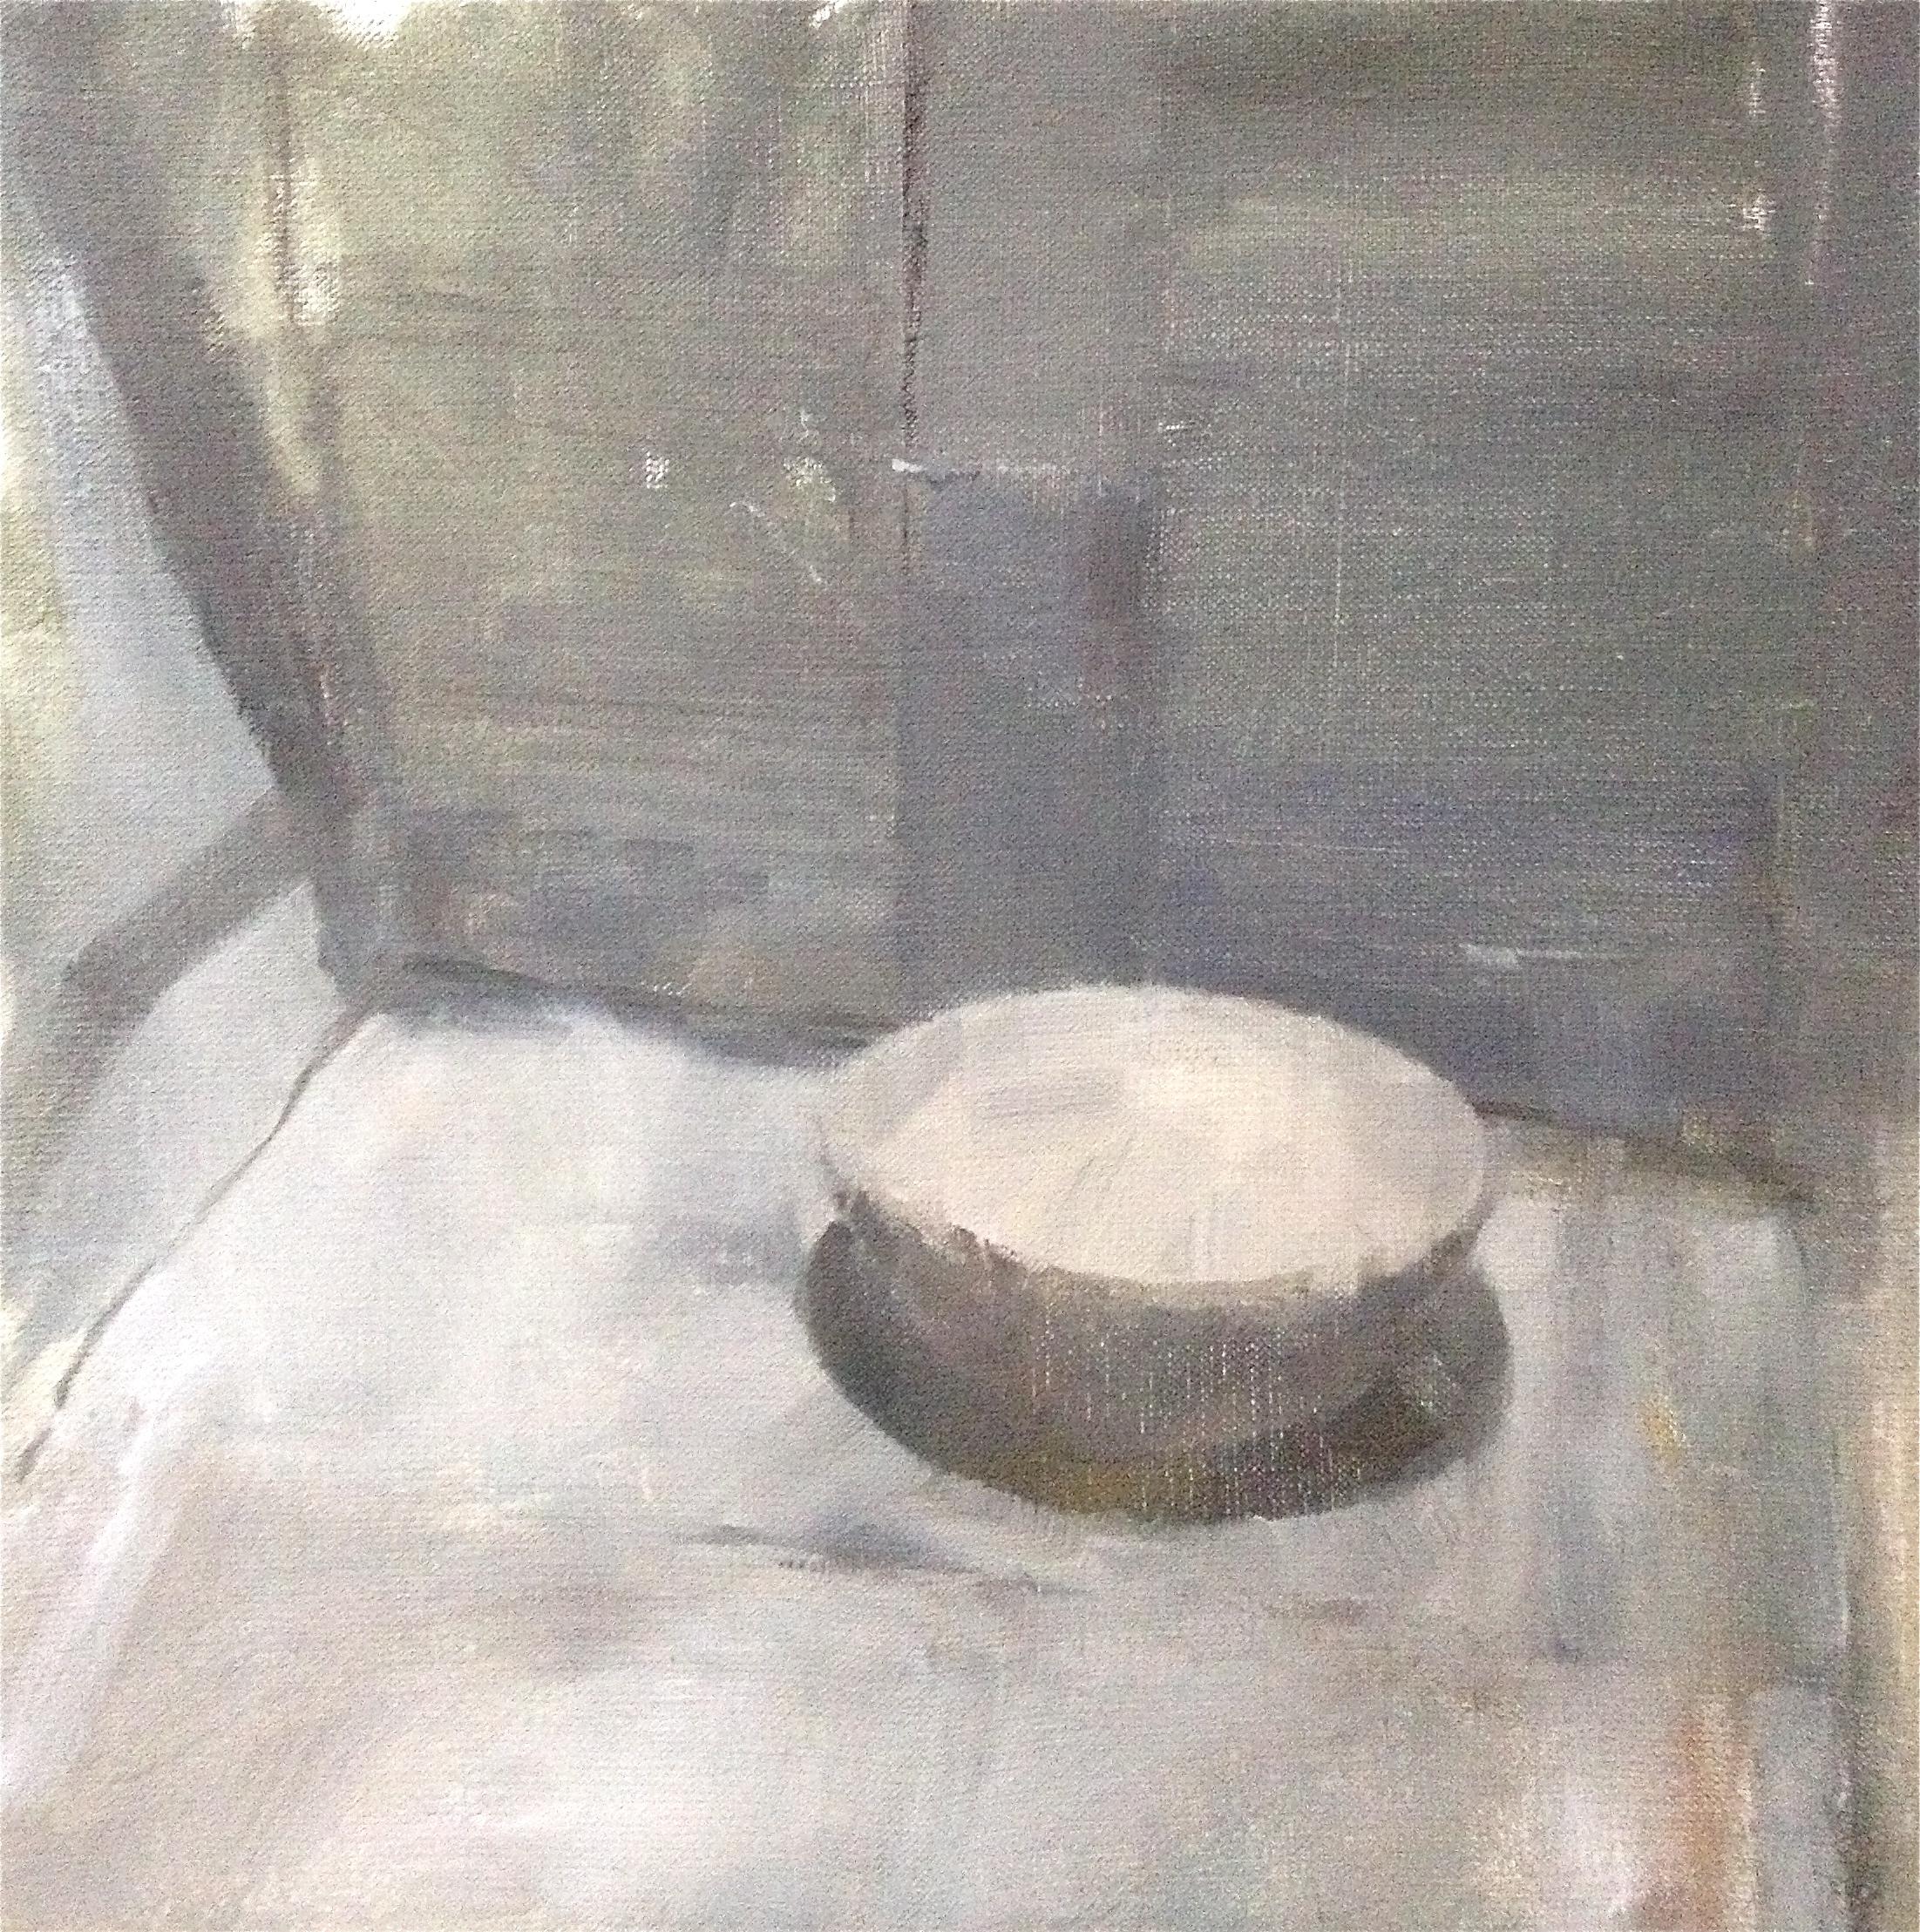 Shadowed Bowl, oil on linen, 35 cm x 35 cm